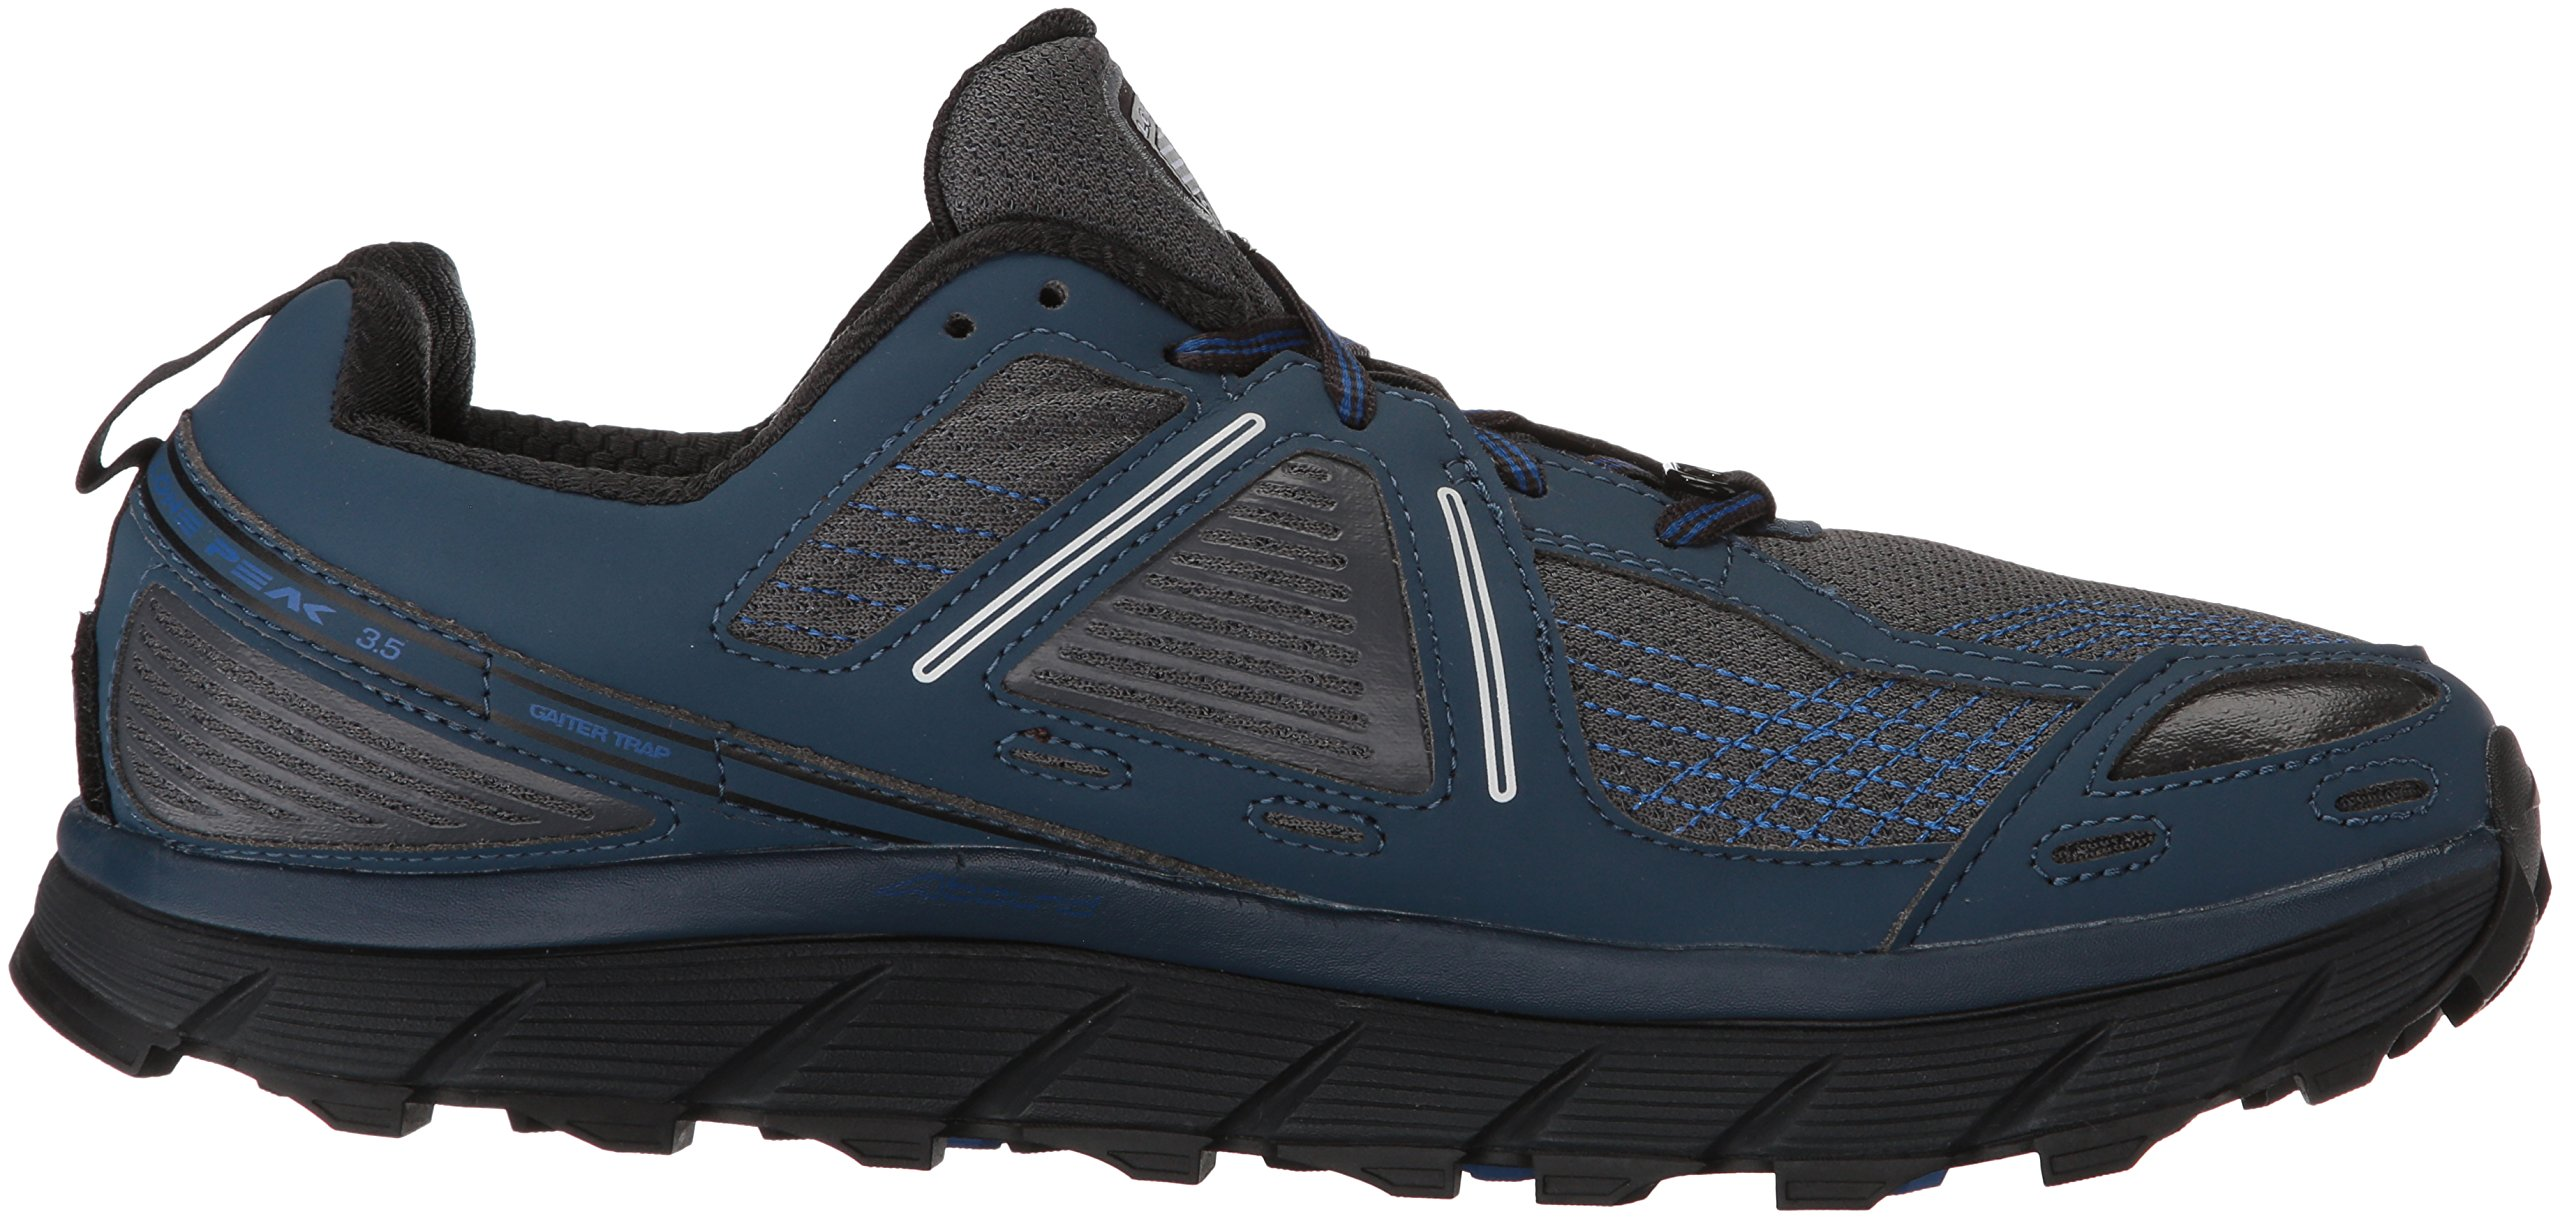 Altra Men's Lone Peak 3.5 Trail Running Shoe, Blue, 12 D US by Altra (Image #7)